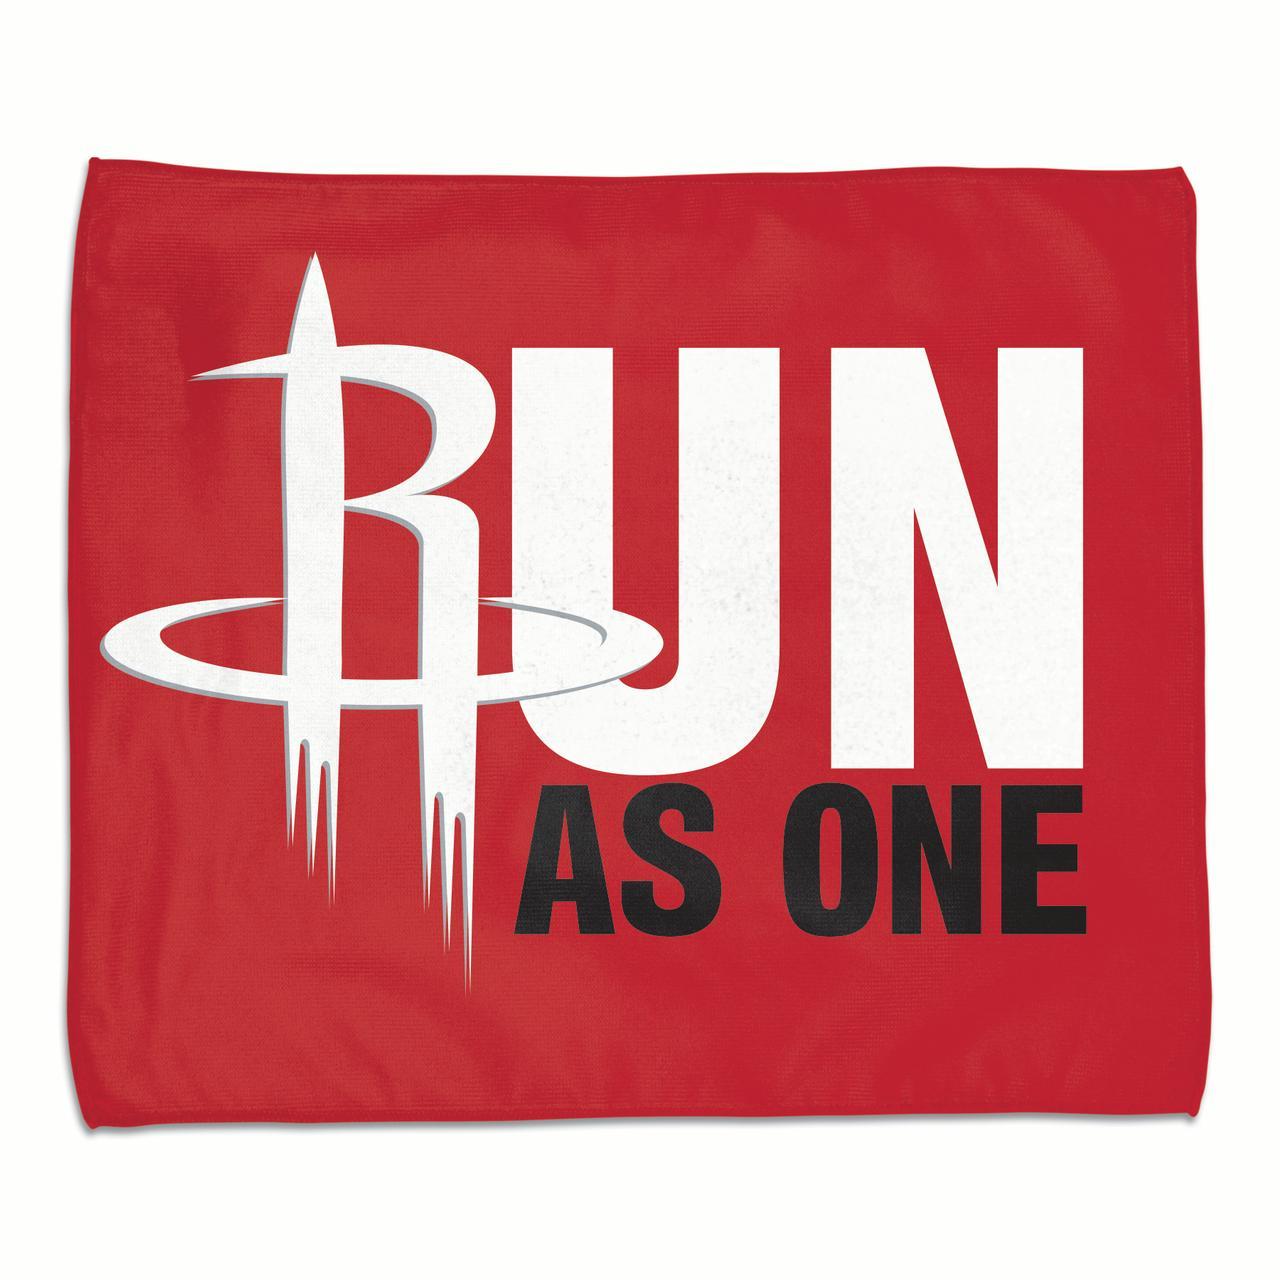 "Houston Rockets WinCraft 2019 NBA Playoffs Bound 15"" x 18"" Rally Towel - No Size"